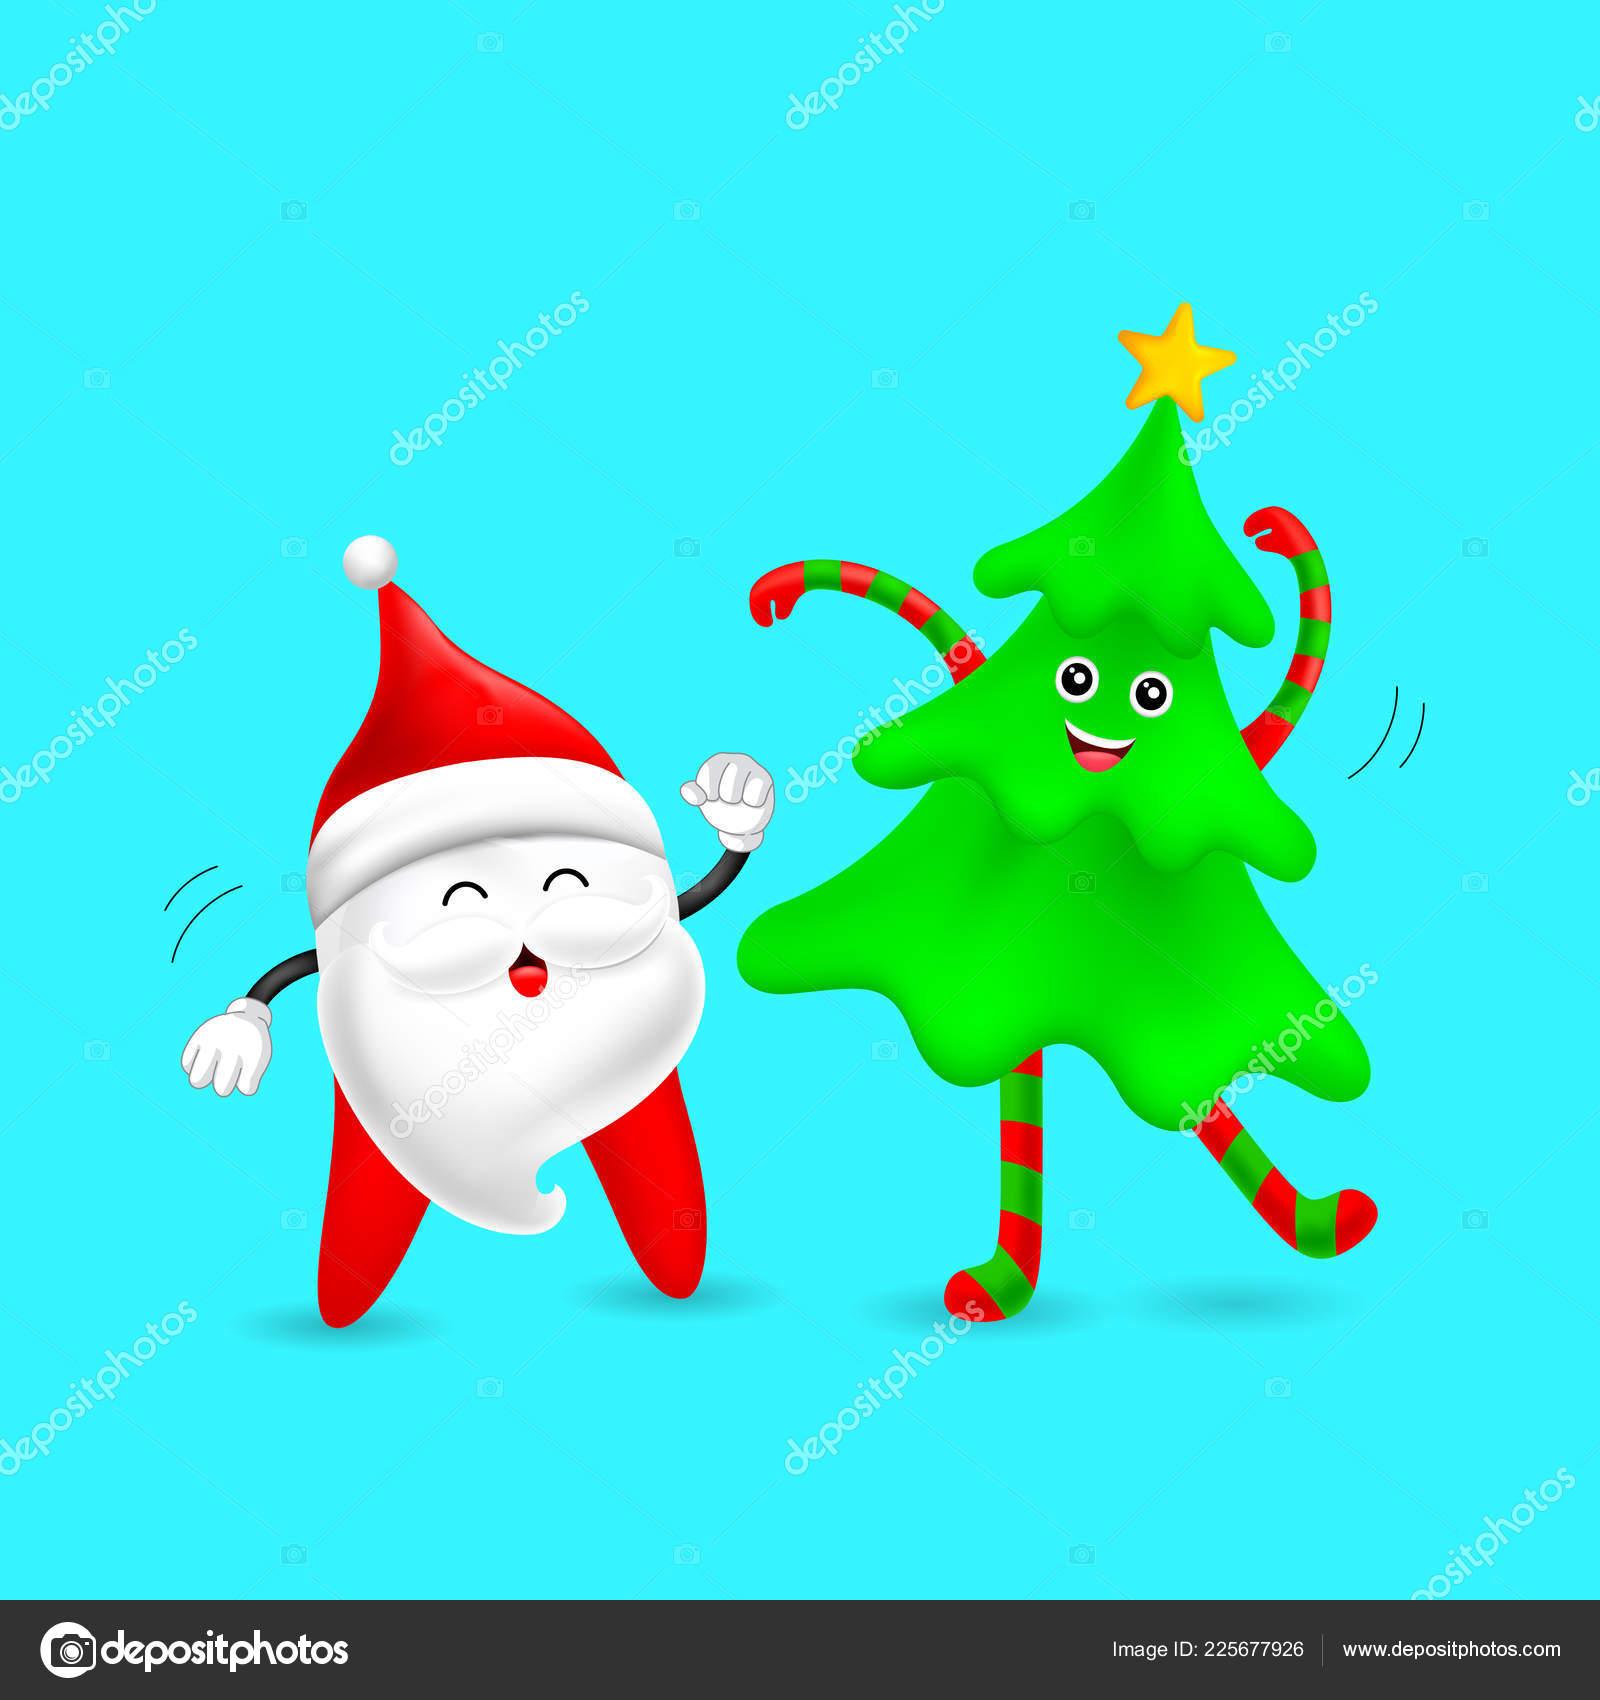 Christmas Dancing Cartoon.Cute Cartoon Santa Tooth Characters Dancing Christmas Tree